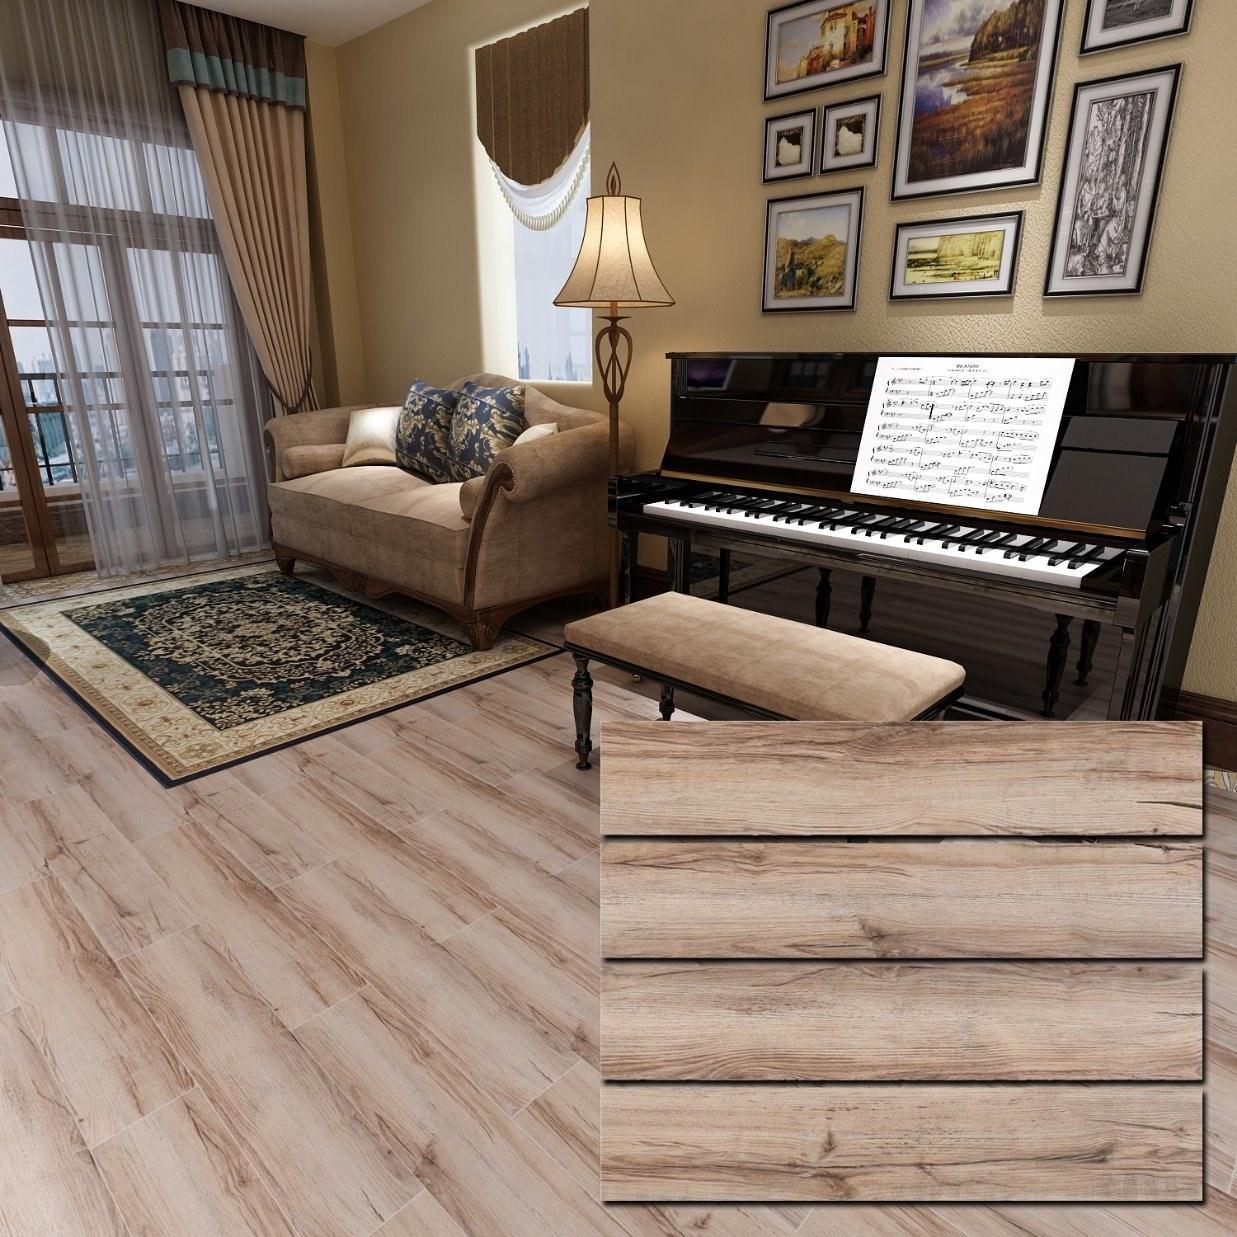 China 150X800Mm Inkjet Printing Wood Look Tile On Stairs China | Wood Look Tile For Stairs | Weathered Wood Distressed | Ceramic | Bedroom | Rocell Living Room | Porcelain